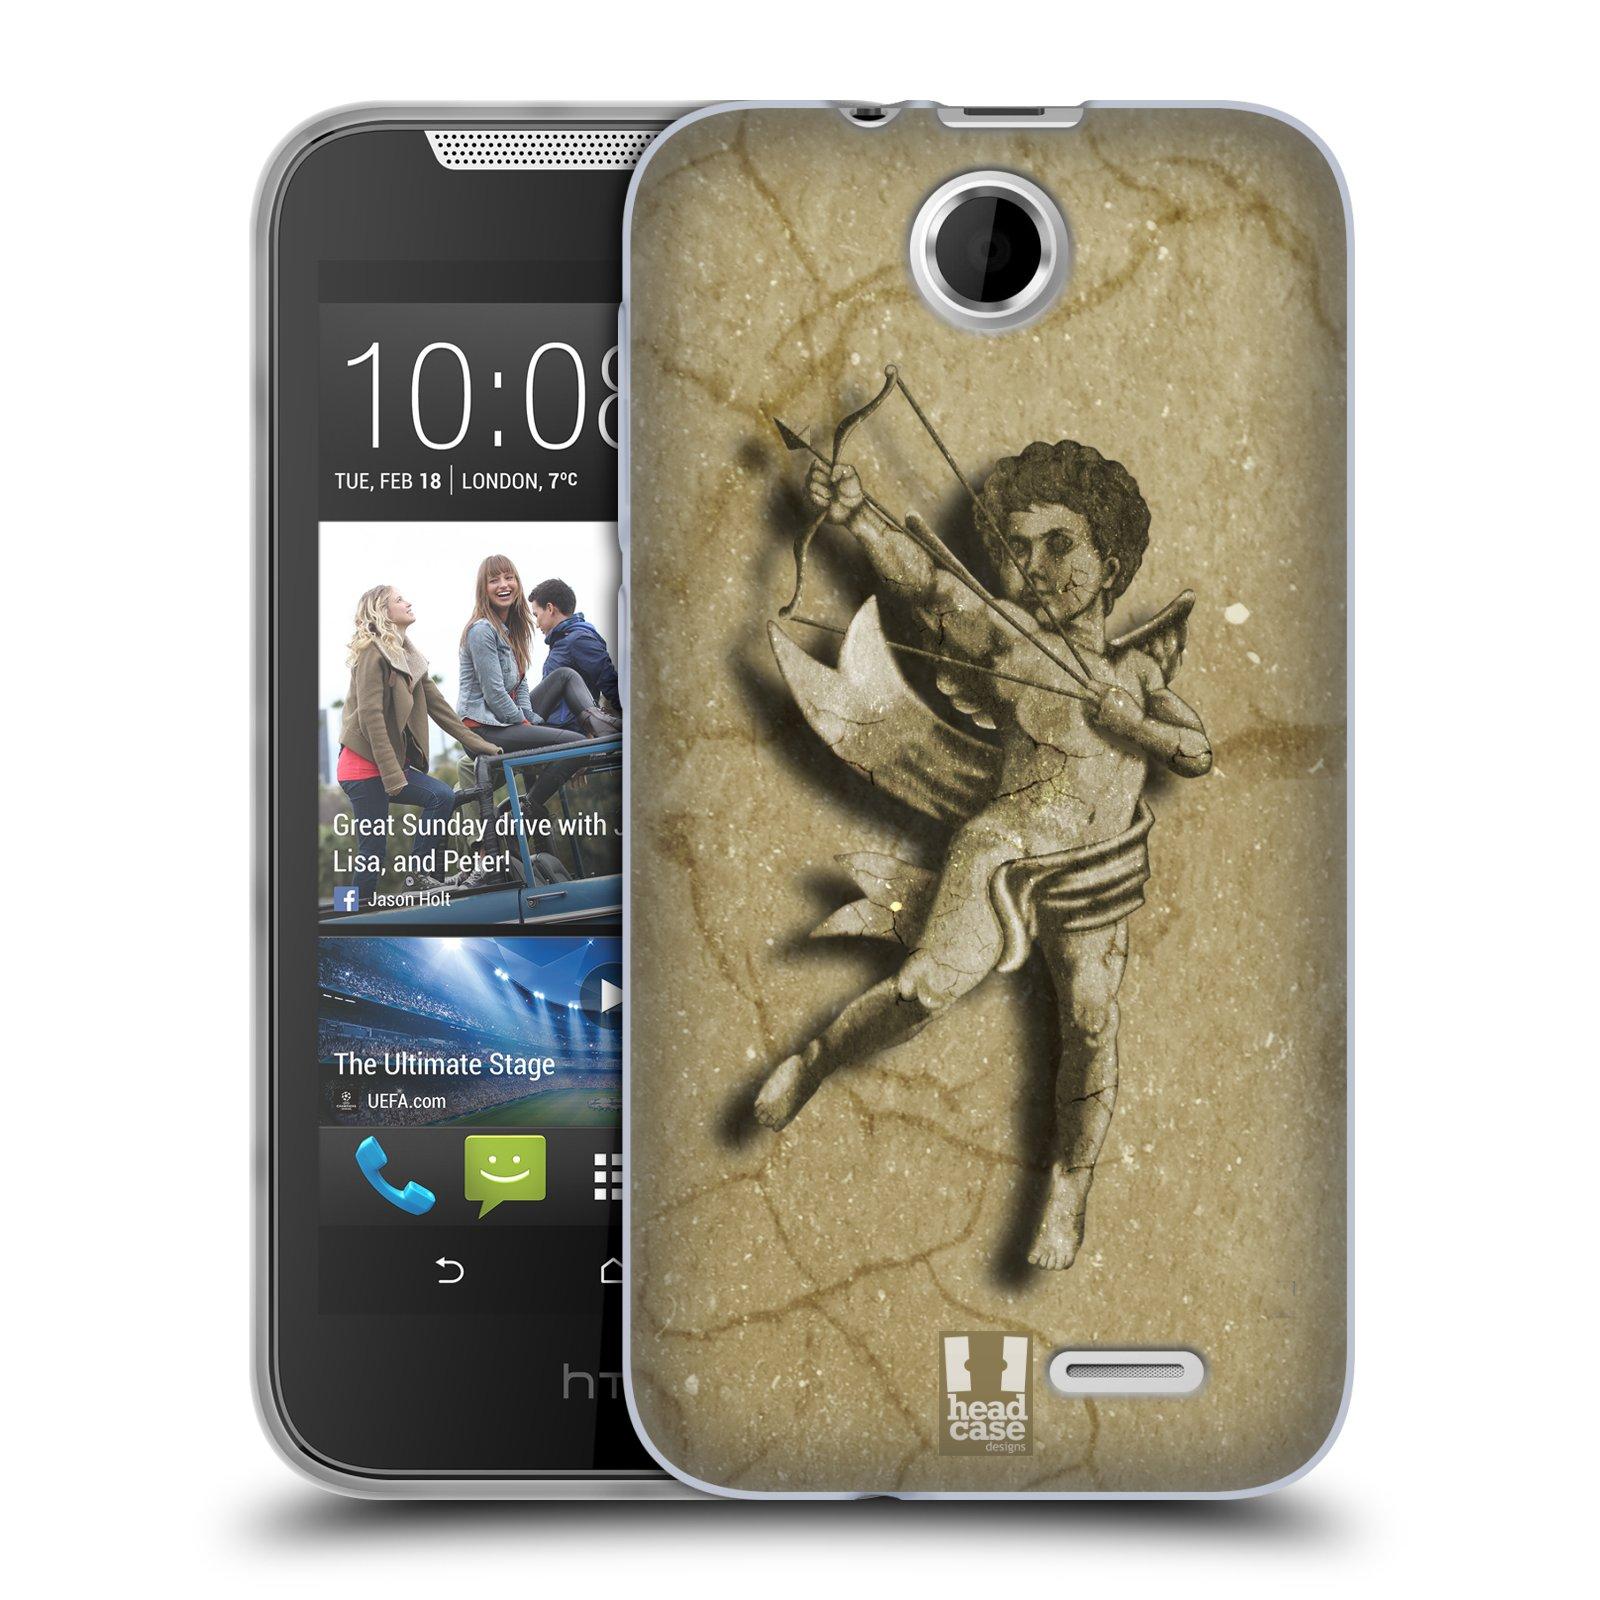 HEAD CASE silikonový obal na mobil HTC DESIRE 310 vzor Andělé z kamene LANCELOT